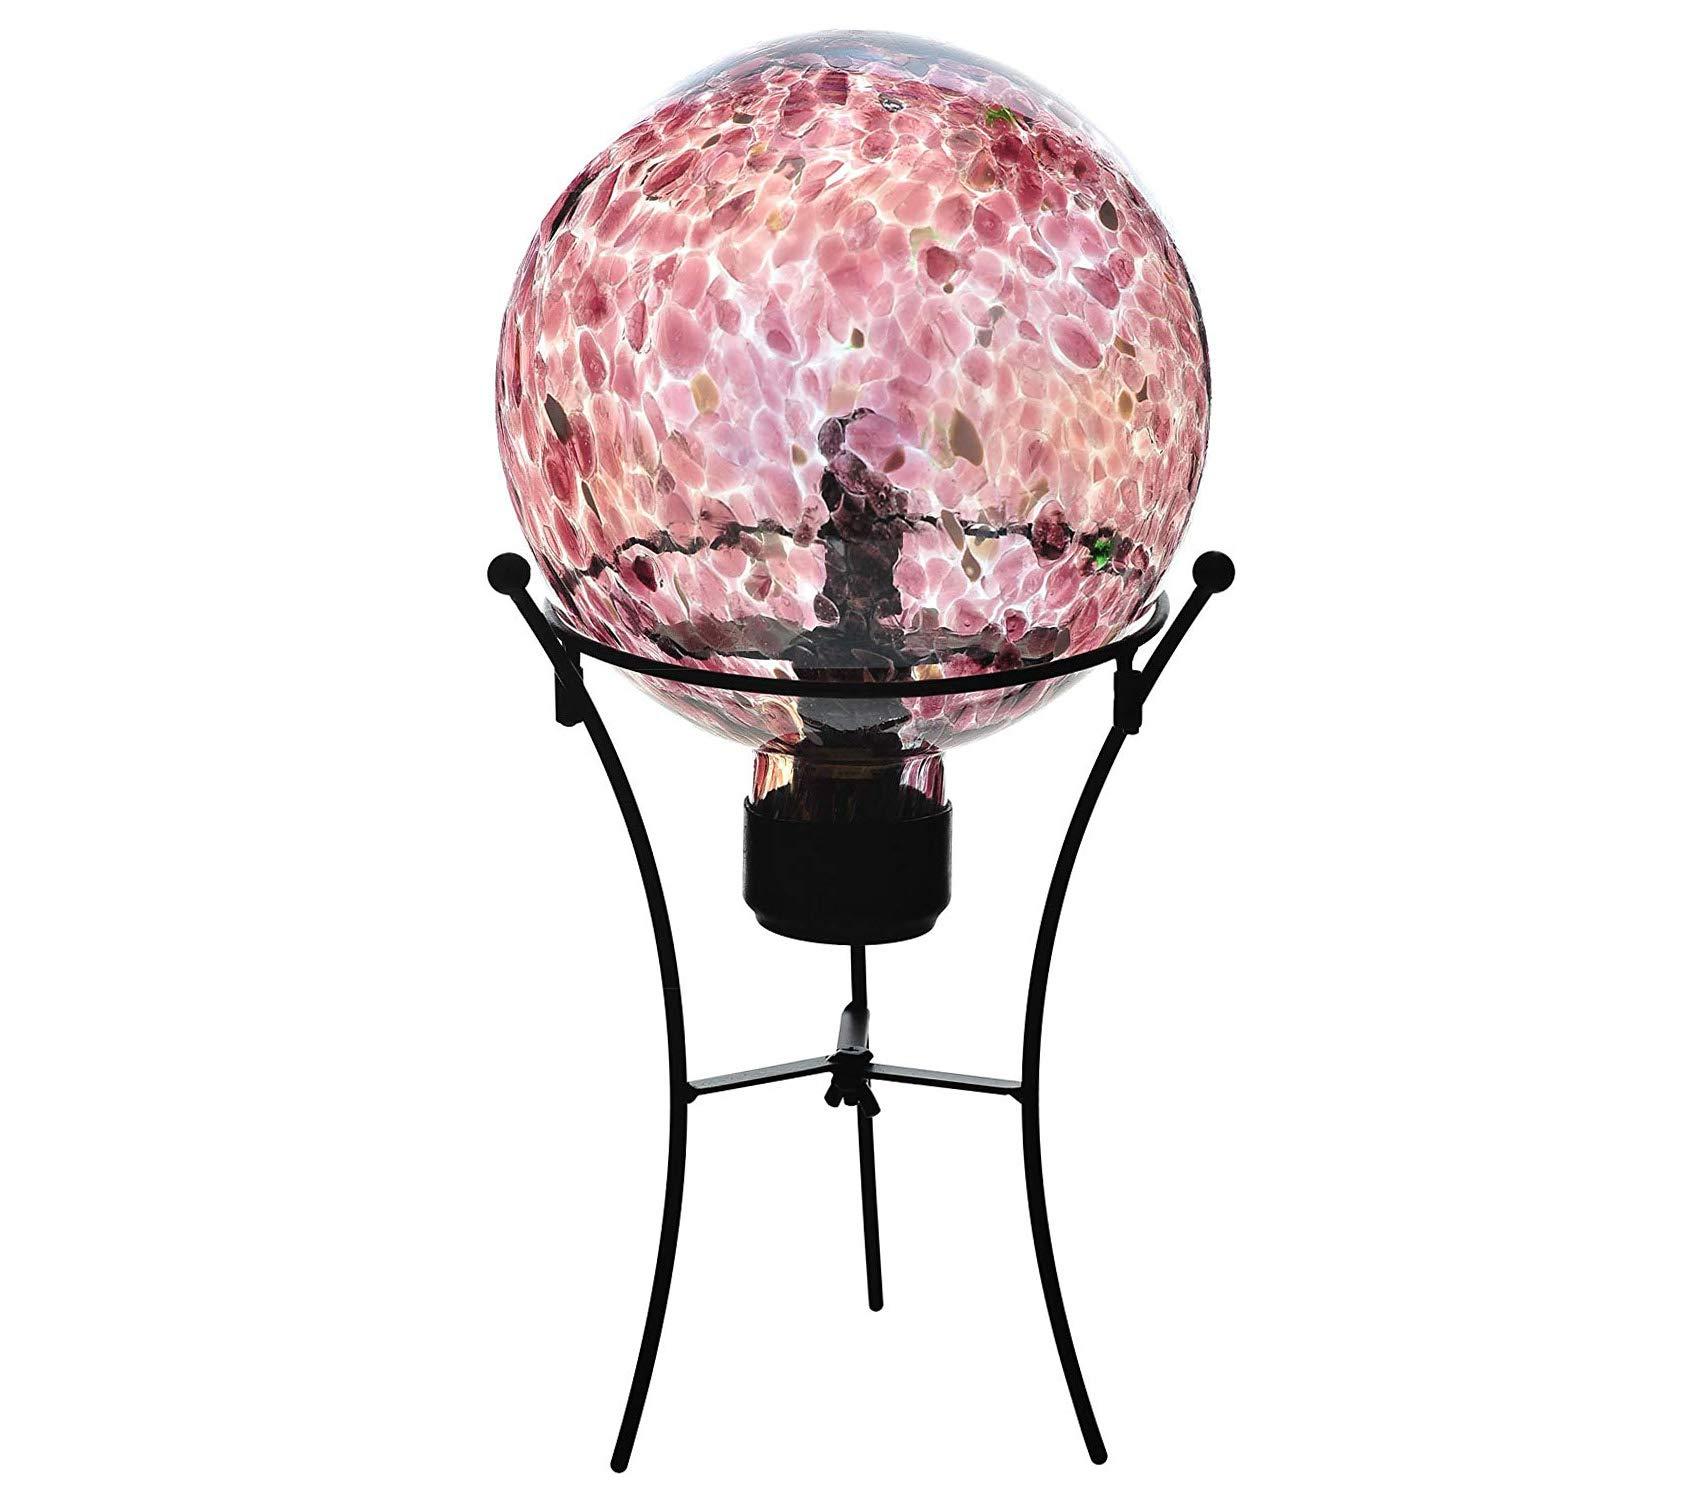 Outdoor Garden Backyard Décor Purple Glass Solar Gazing Ball LED Insert and Wire St, 8 Inch